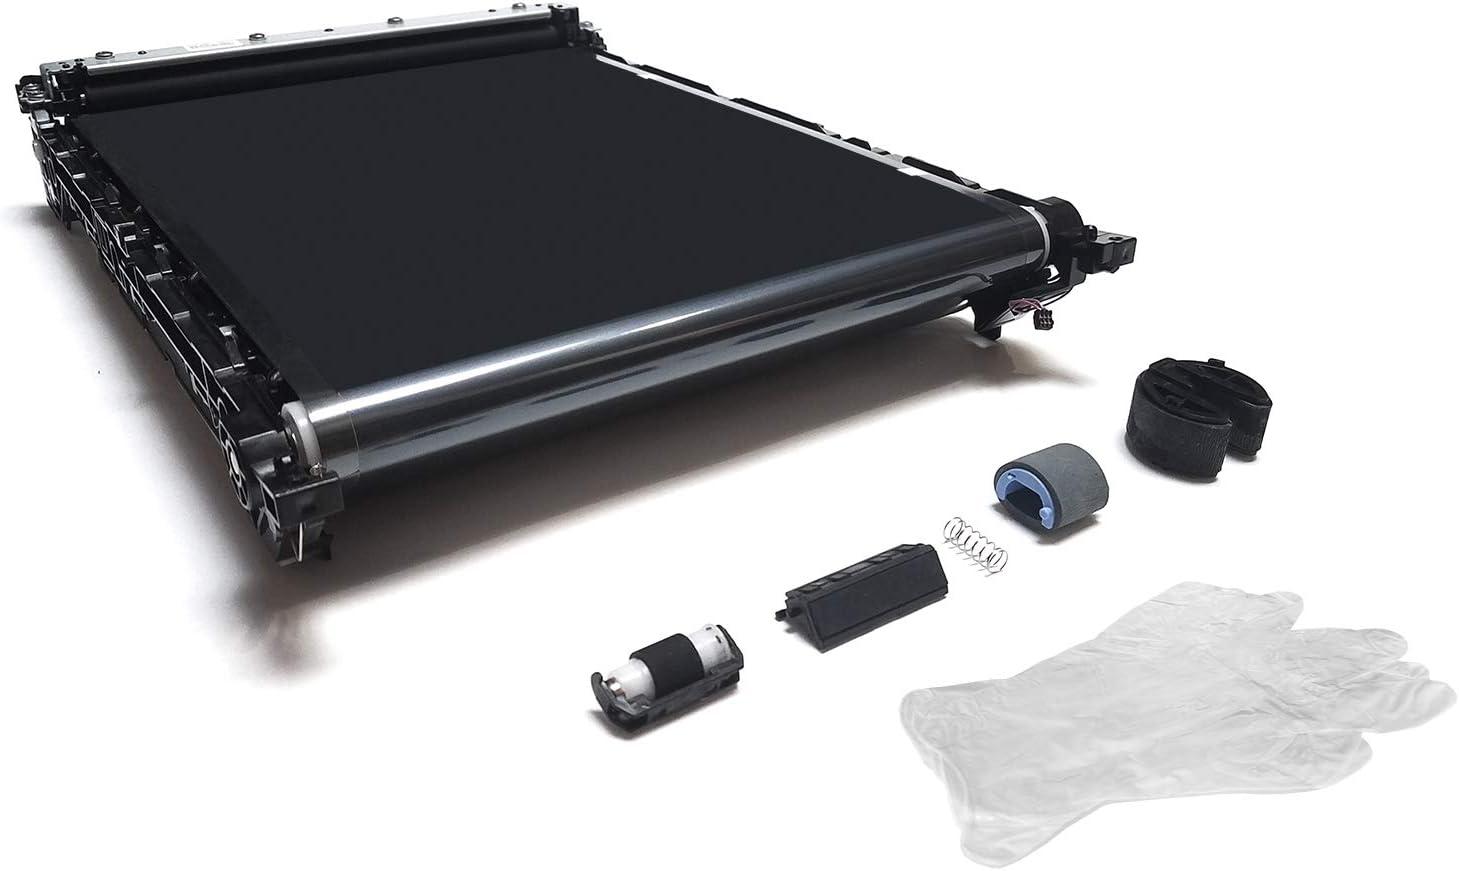 Altru Print RM1-4852-TK-AP (RM2-0192) Transfer Kit for HP Color Laserjet CP2025, CM2320 / HP Laserjet Pro 400 Color M451, M475, M476 Includes Intermediate Transfer Belt (ITB) & Rollers for Tray 1-2